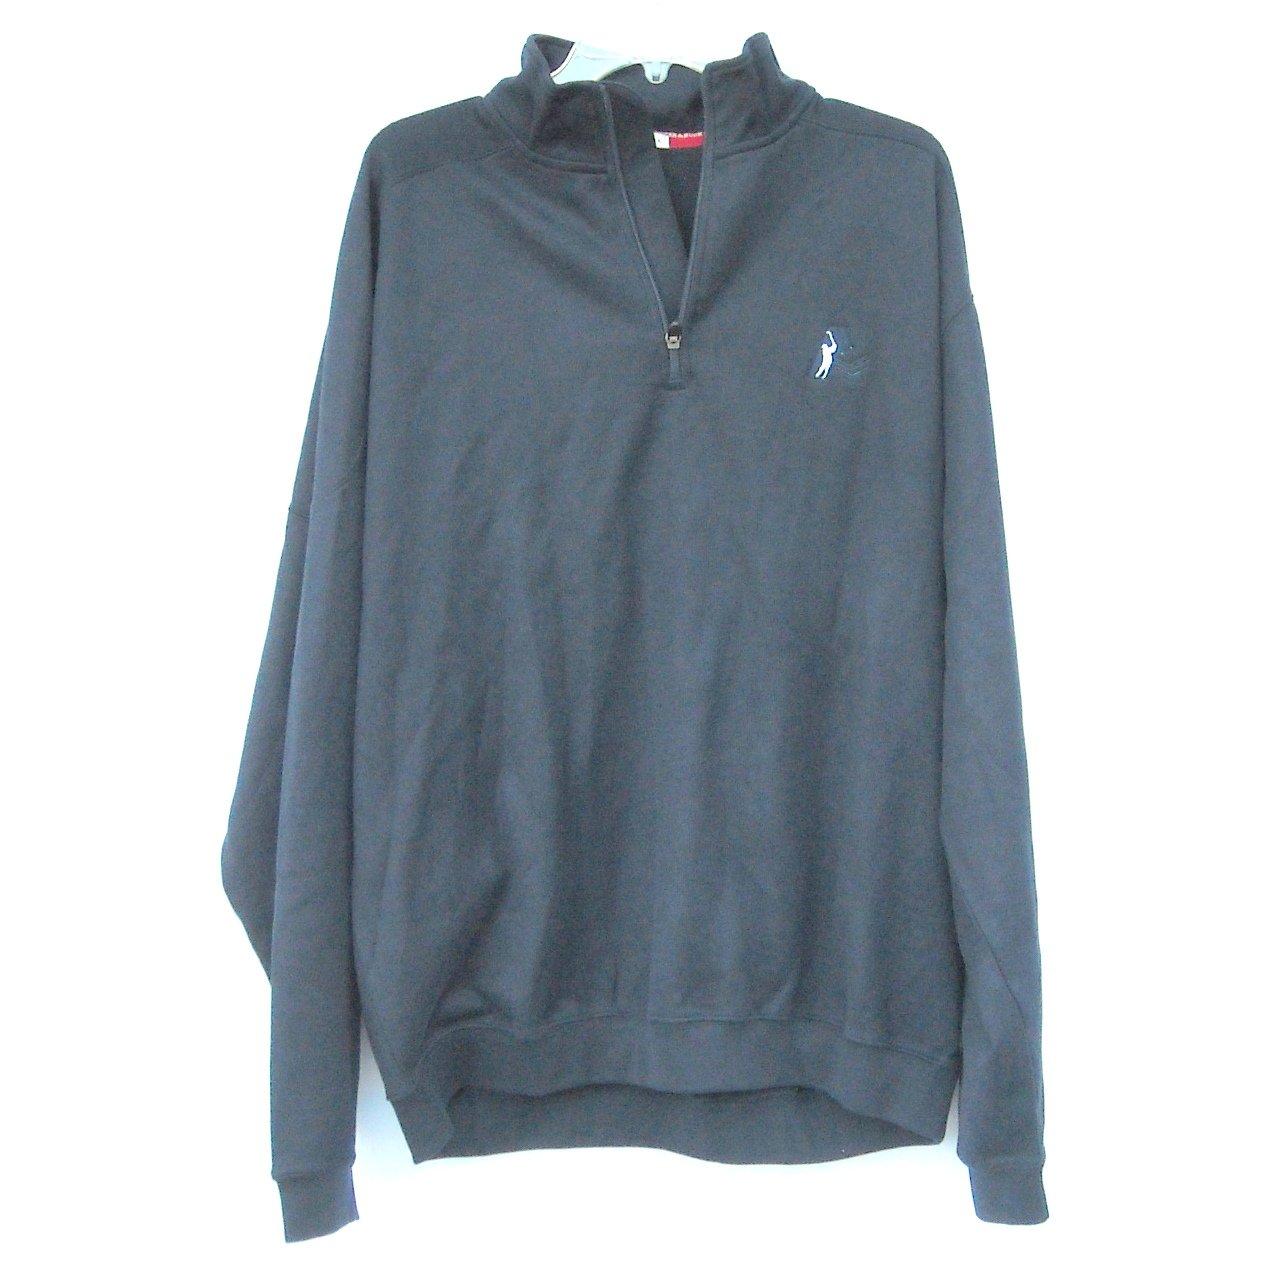 Golf Sportswear Mens Navy Blue Pullover Sweatshirt Fleece Size XL TG